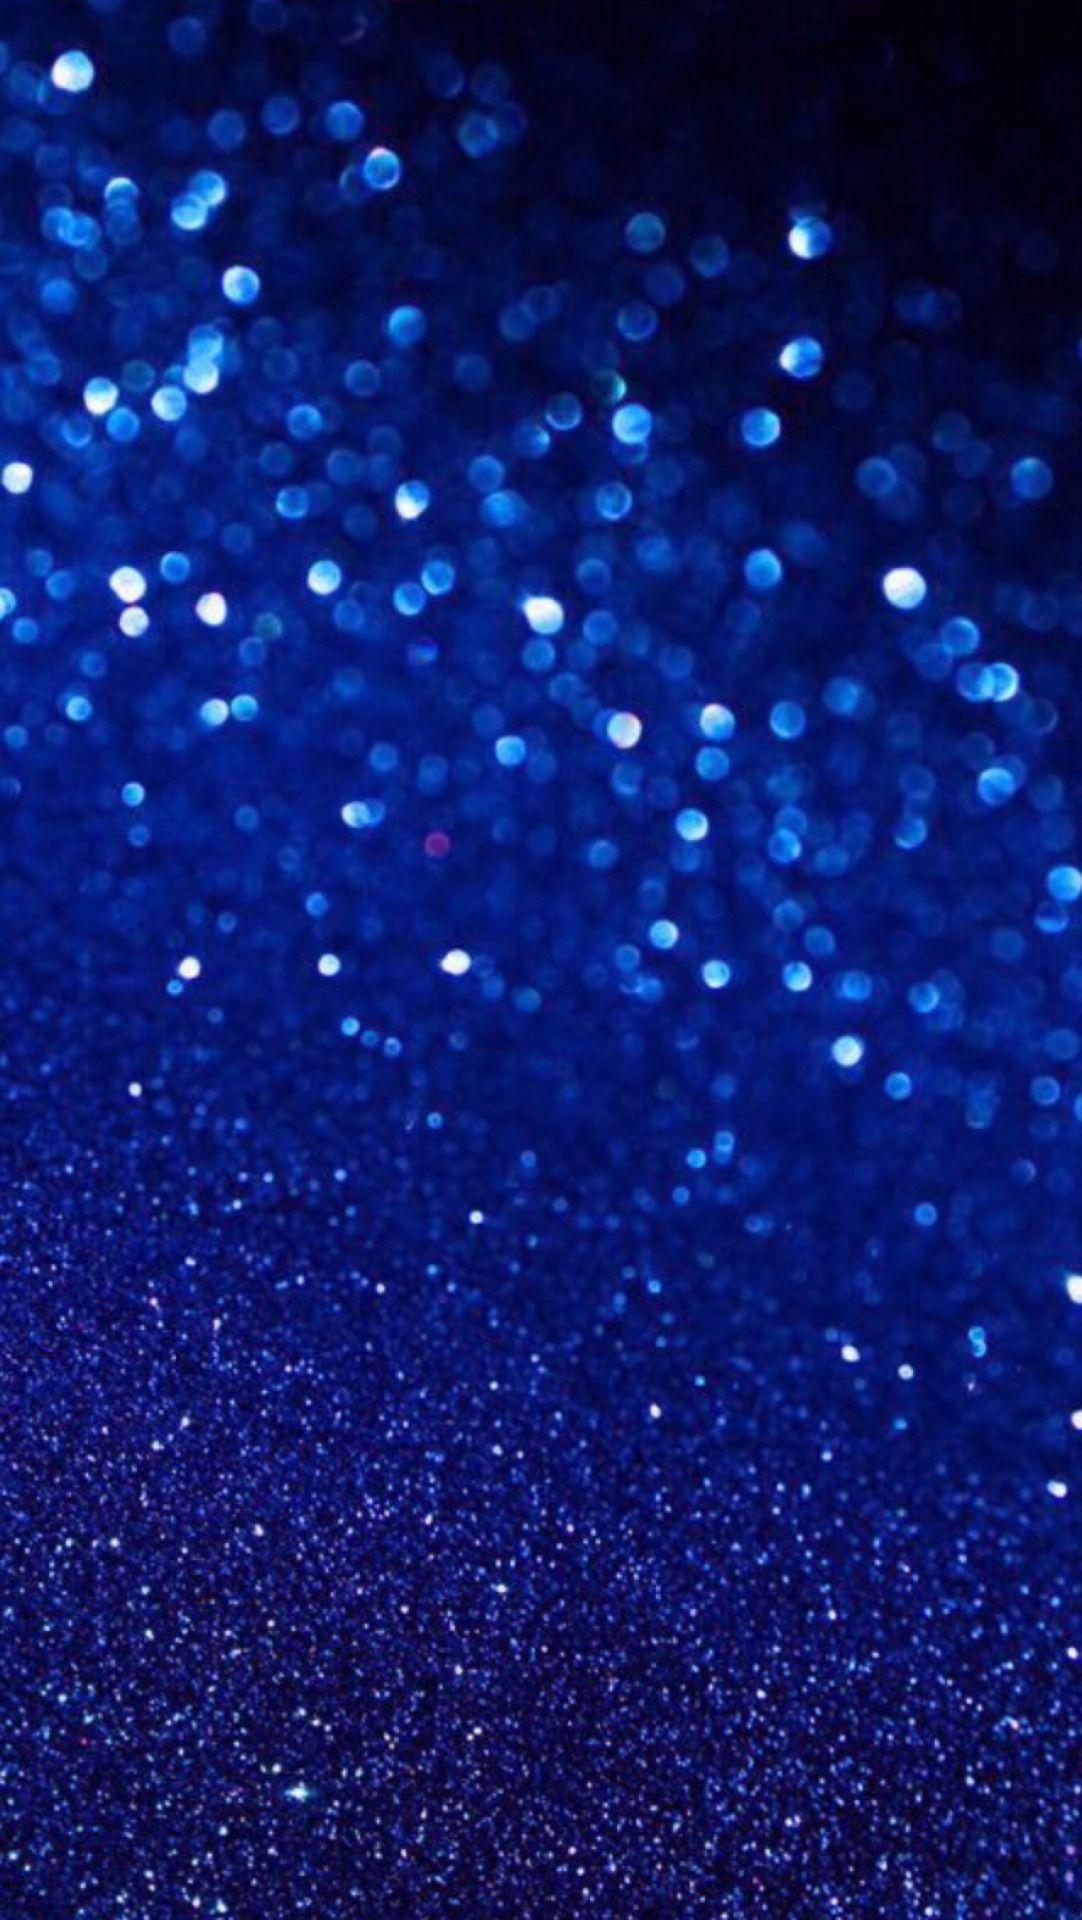 Blue Aesthetic Blue Glow Blue Aesthetic Blue Aesthetic Dark Blue Aesthetic Grunge